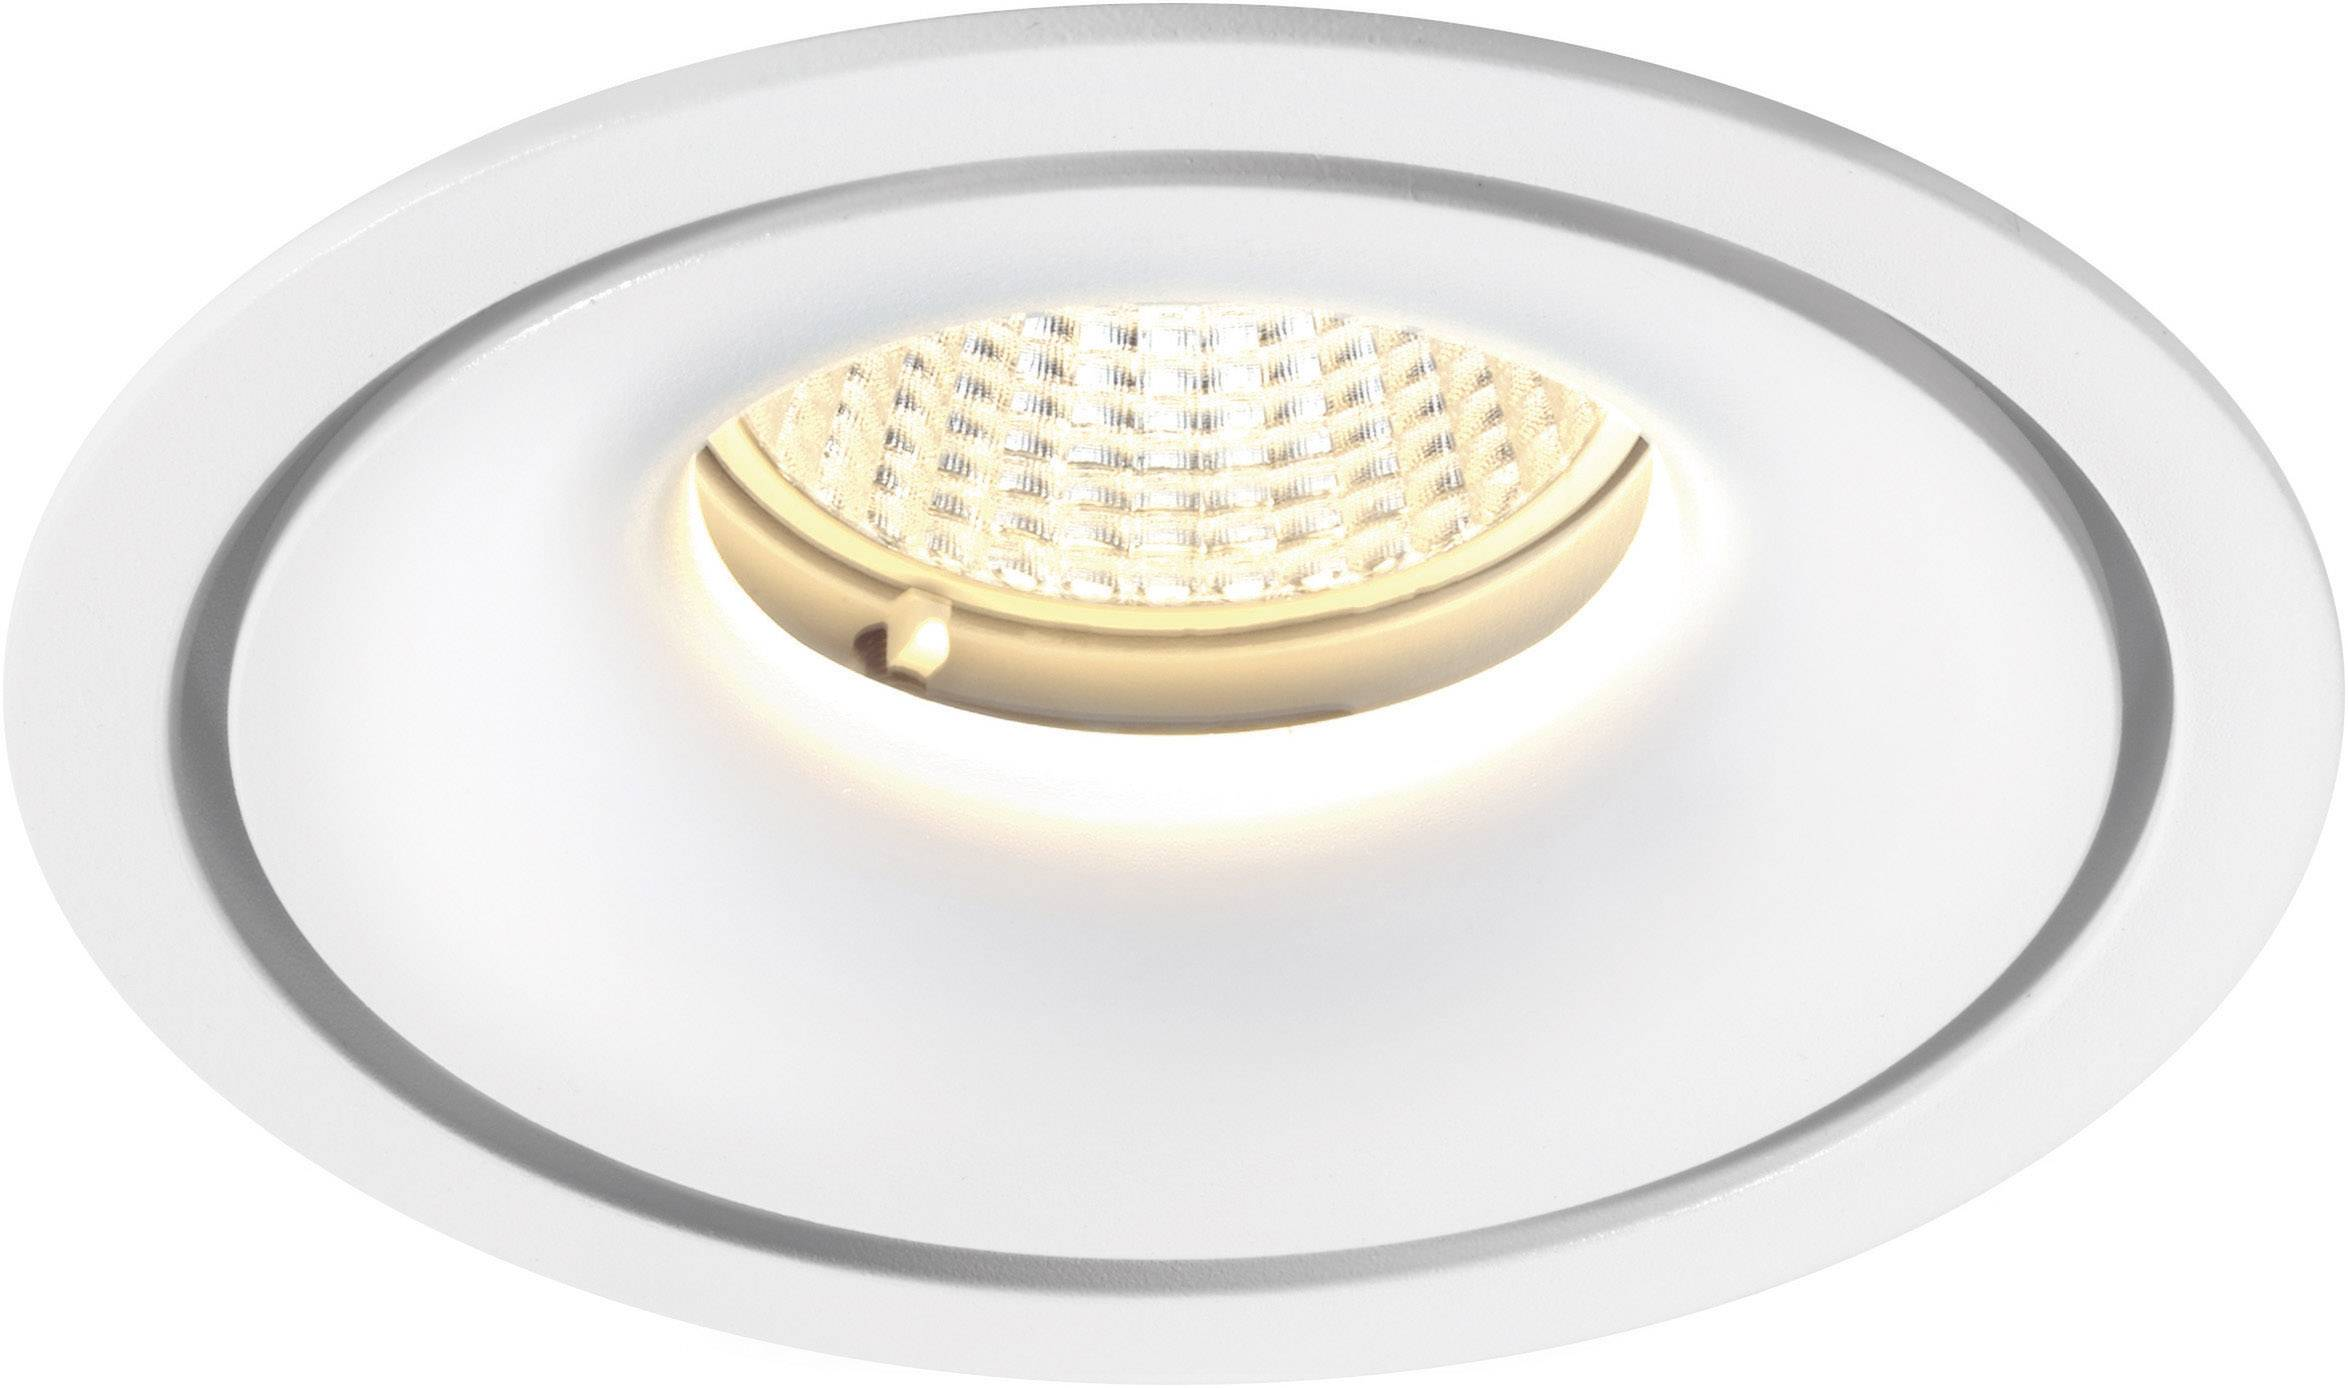 LED vstavané svetlo Sygonix Enna 12593Y, 10 W, teplá biela, biela